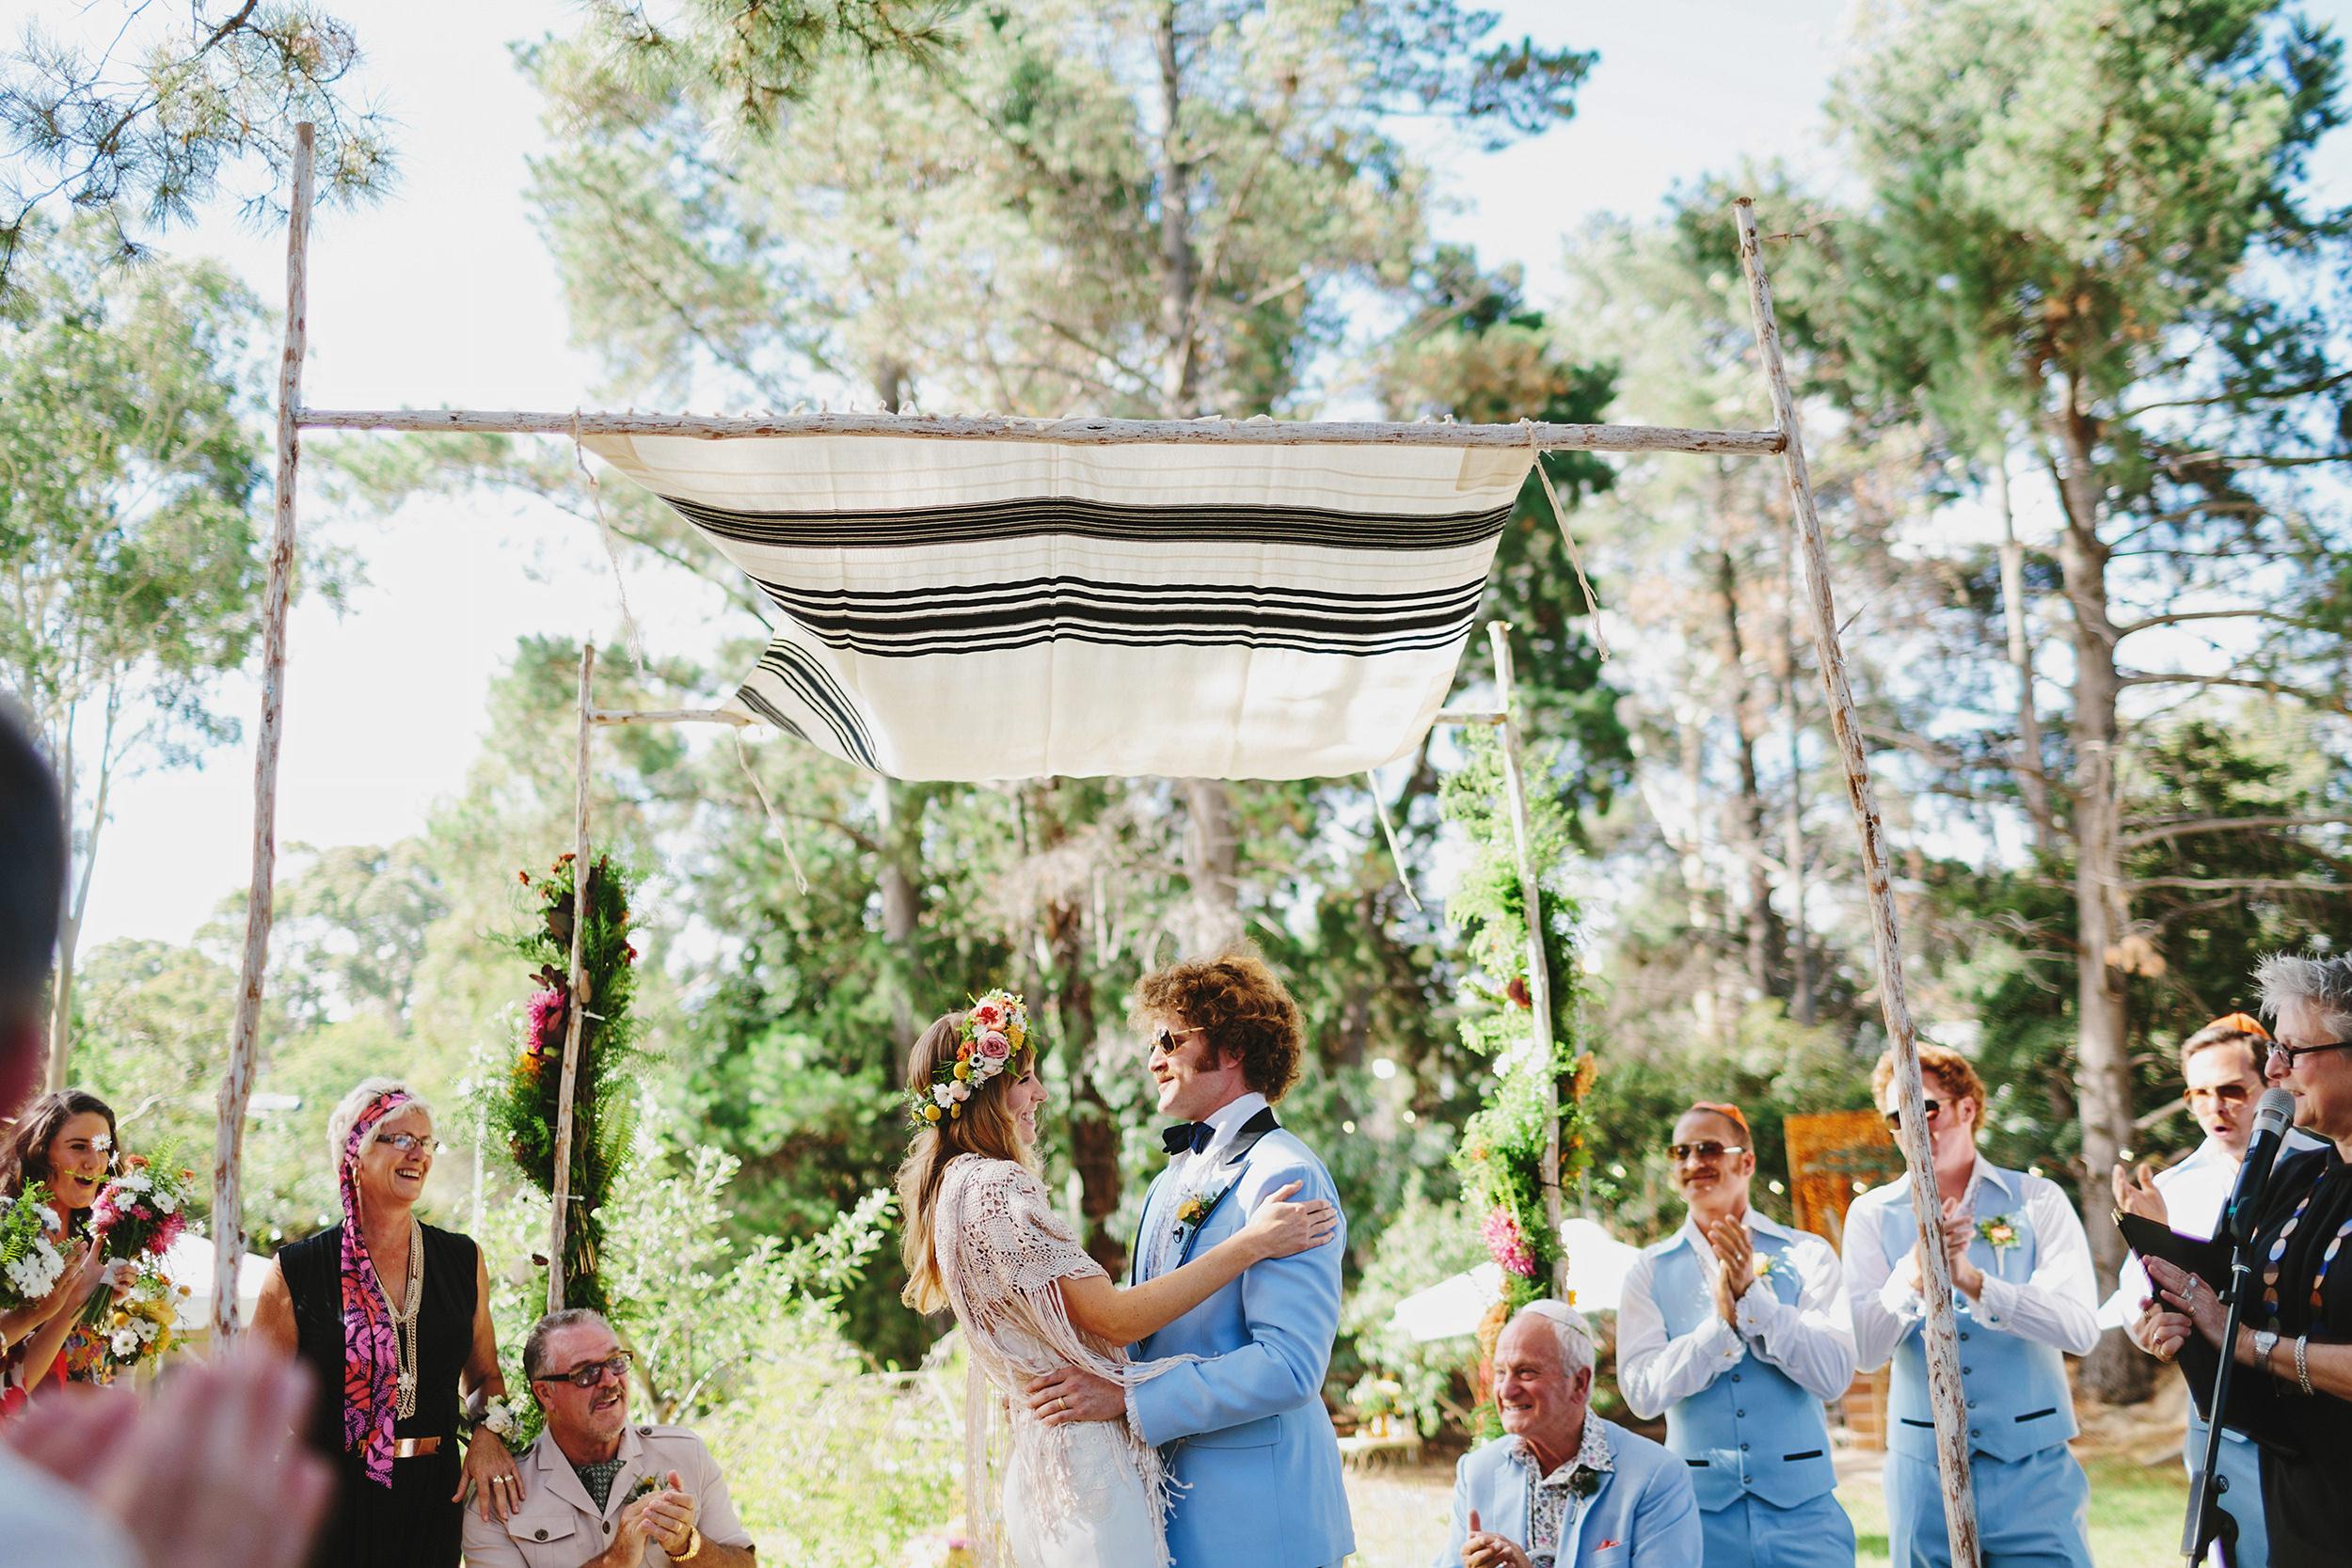 Melbourne_Vintage_Backyard_Wedding_Ben_Erin 039.JPG